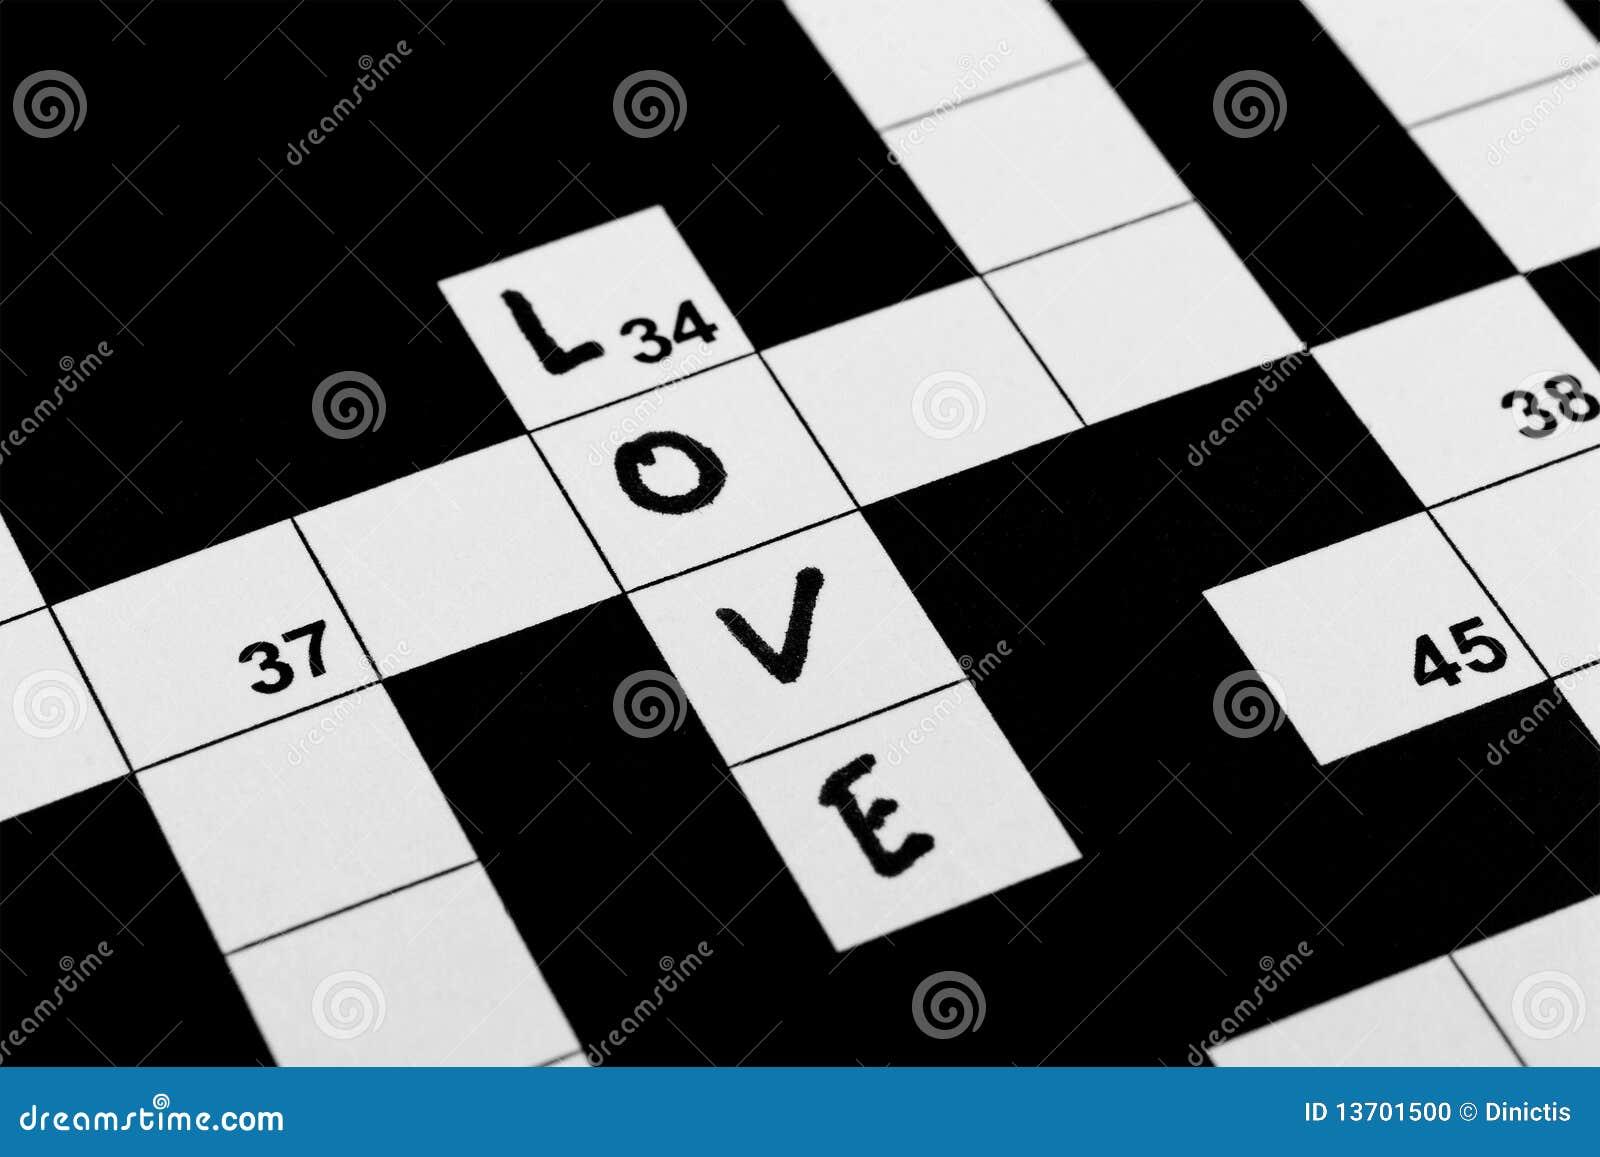 Essays in love writer crossword clue